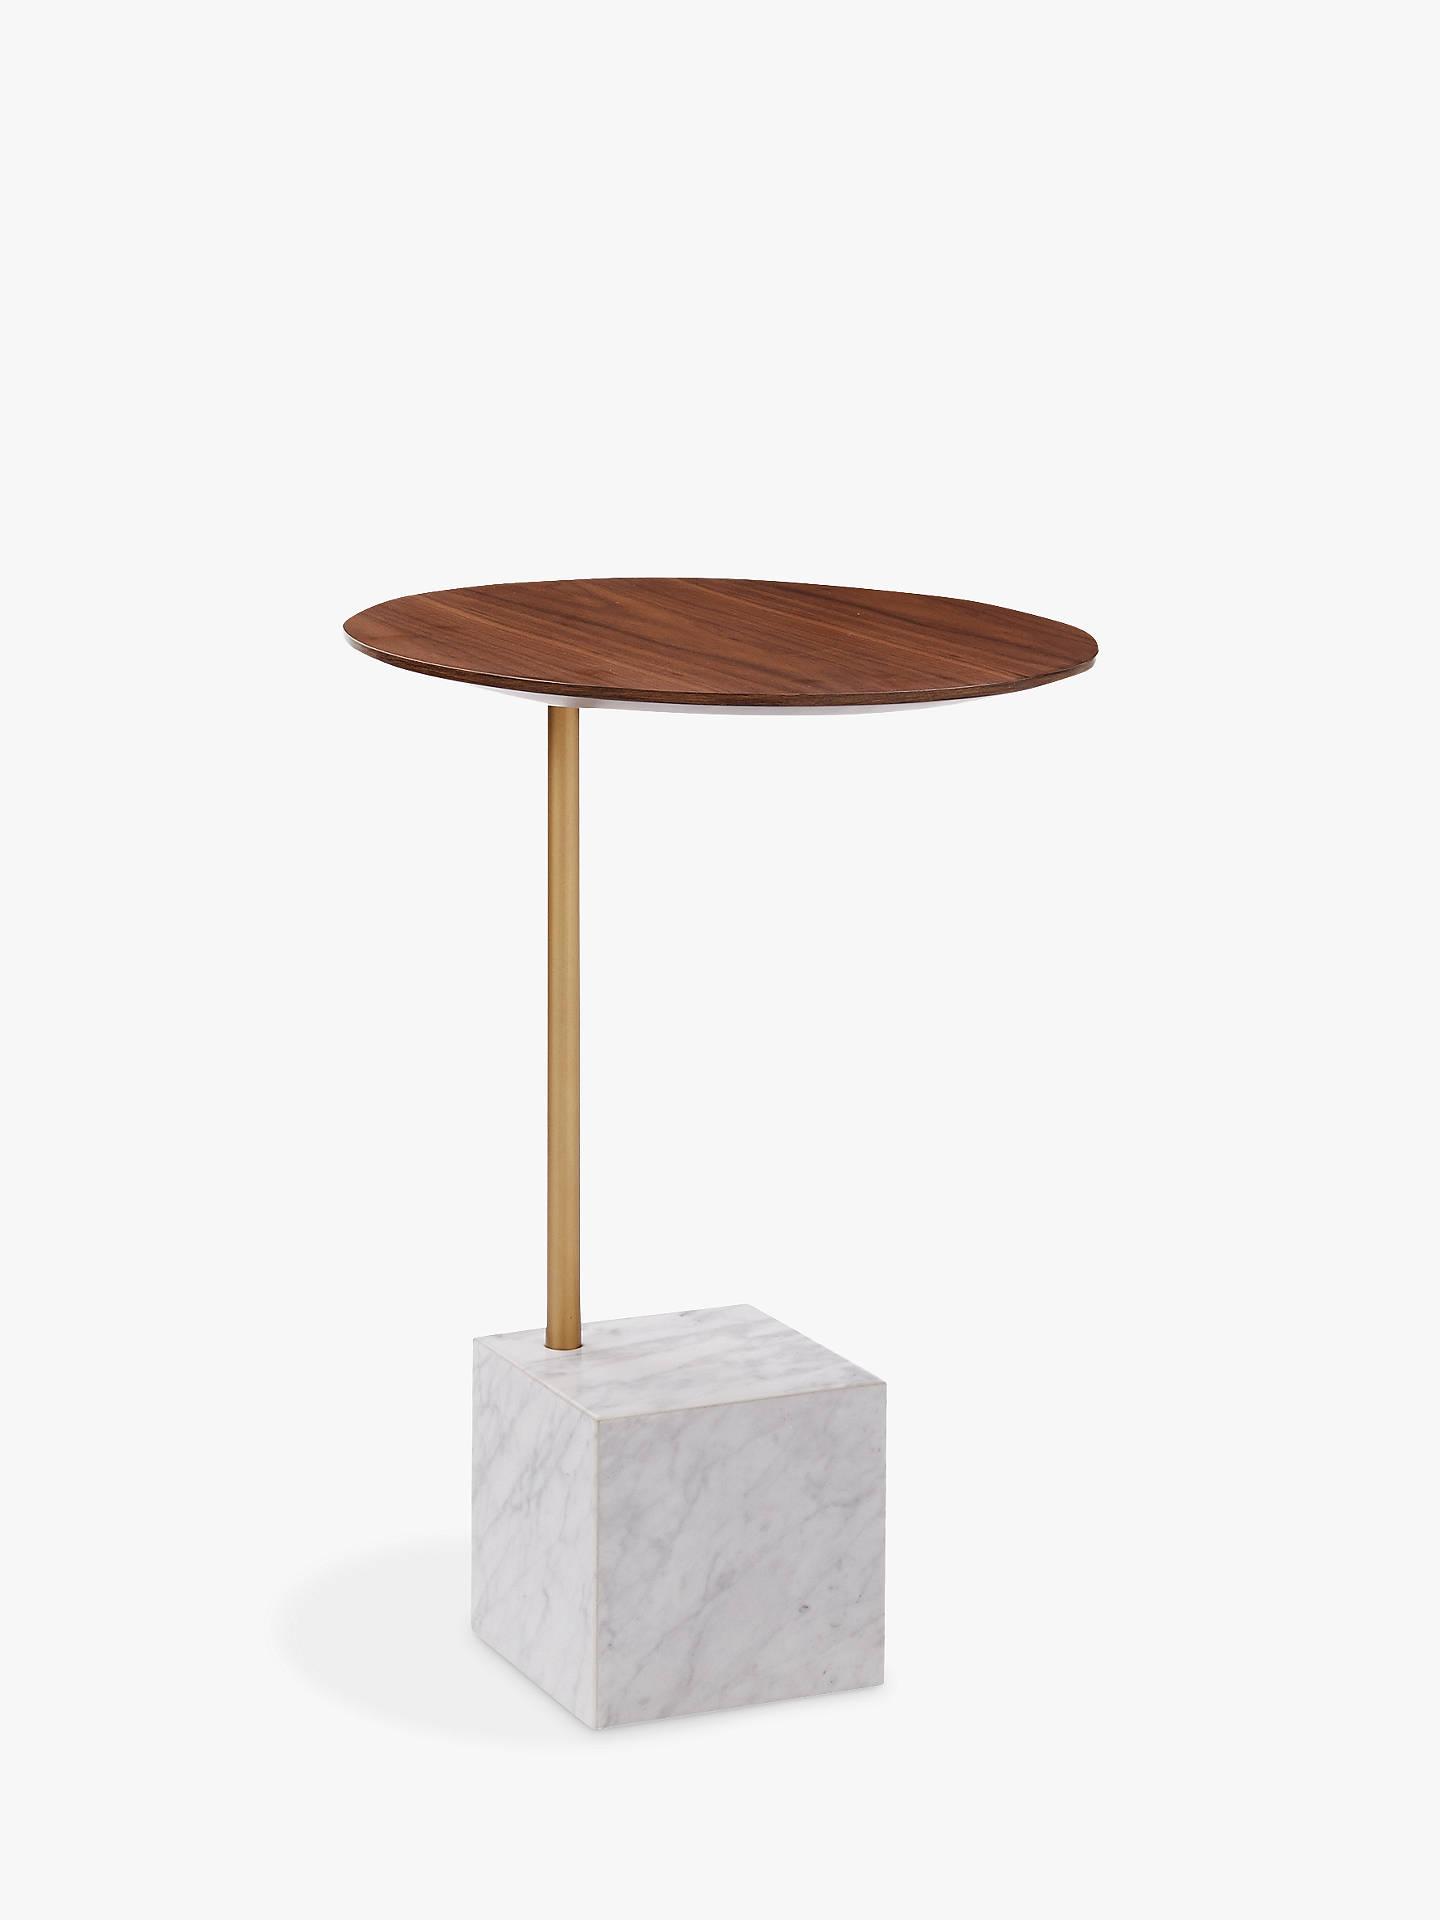 john lewis side table with drawer elcho table. Black Bedroom Furniture Sets. Home Design Ideas